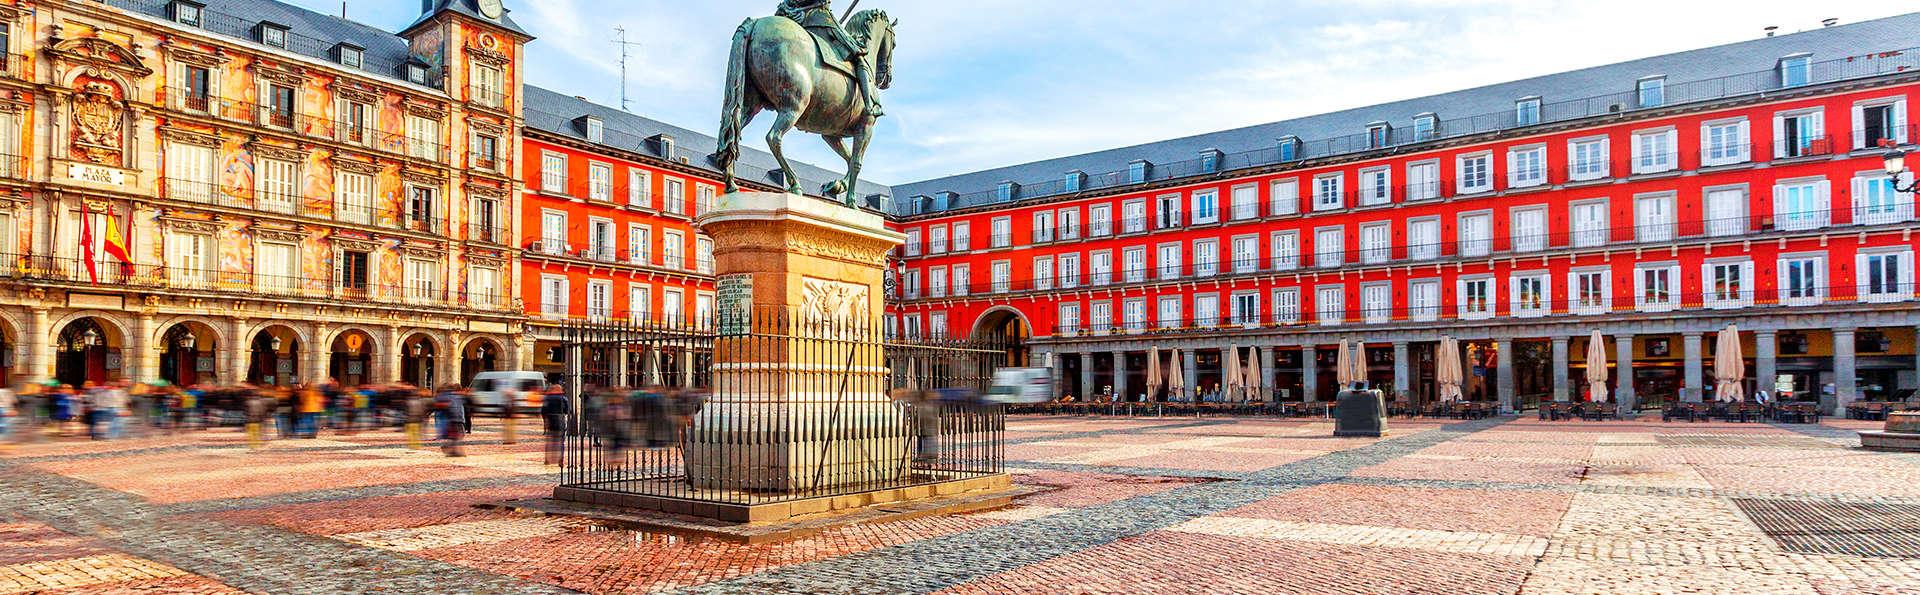 Hotel Sercotel Princesa de Éboli - EDIT_destination.jpg